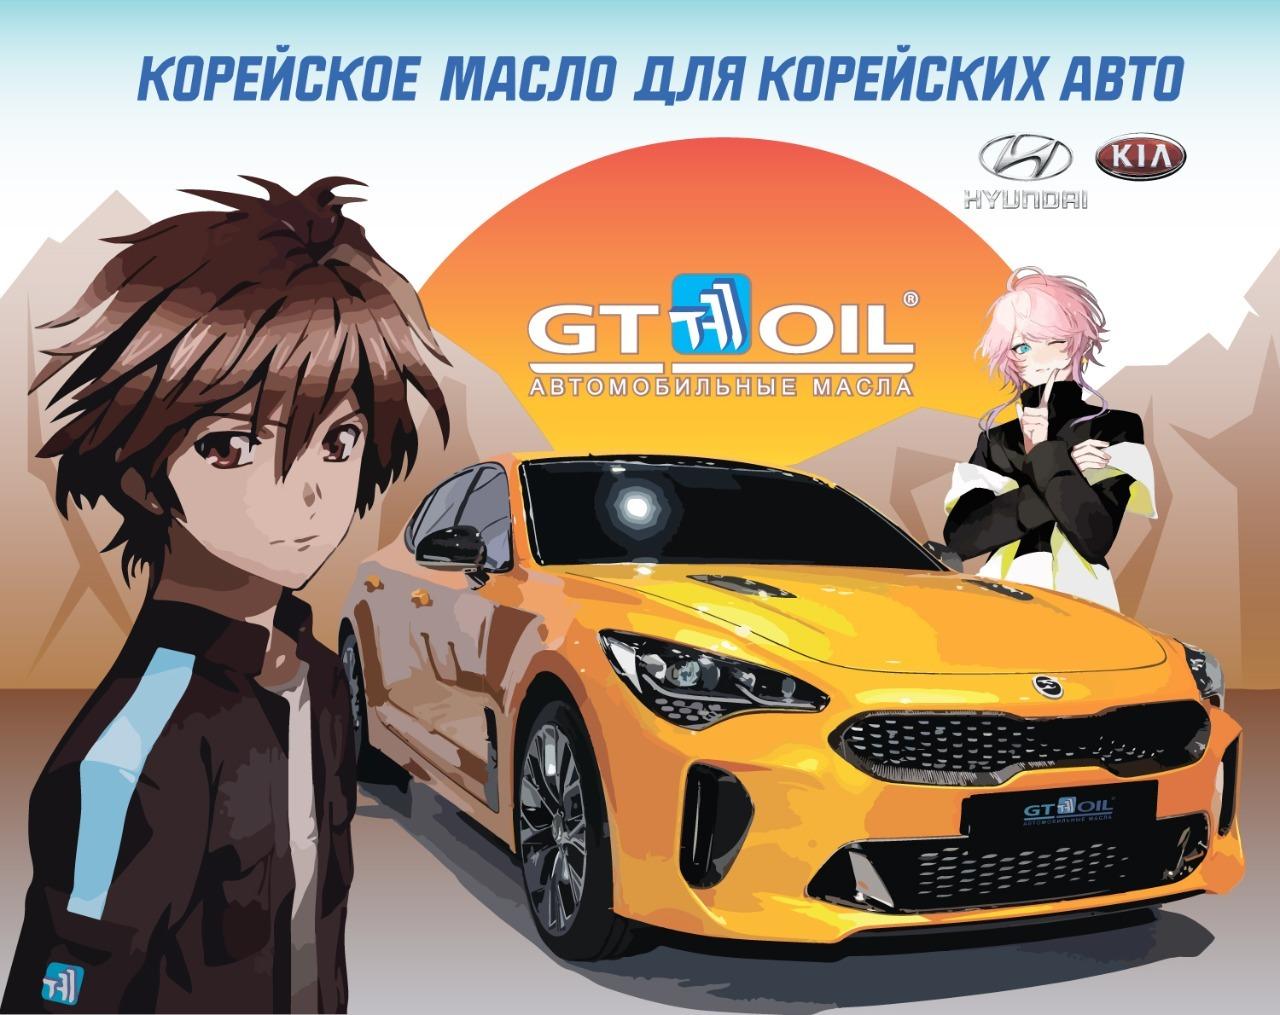 korea-gtoil.jpg